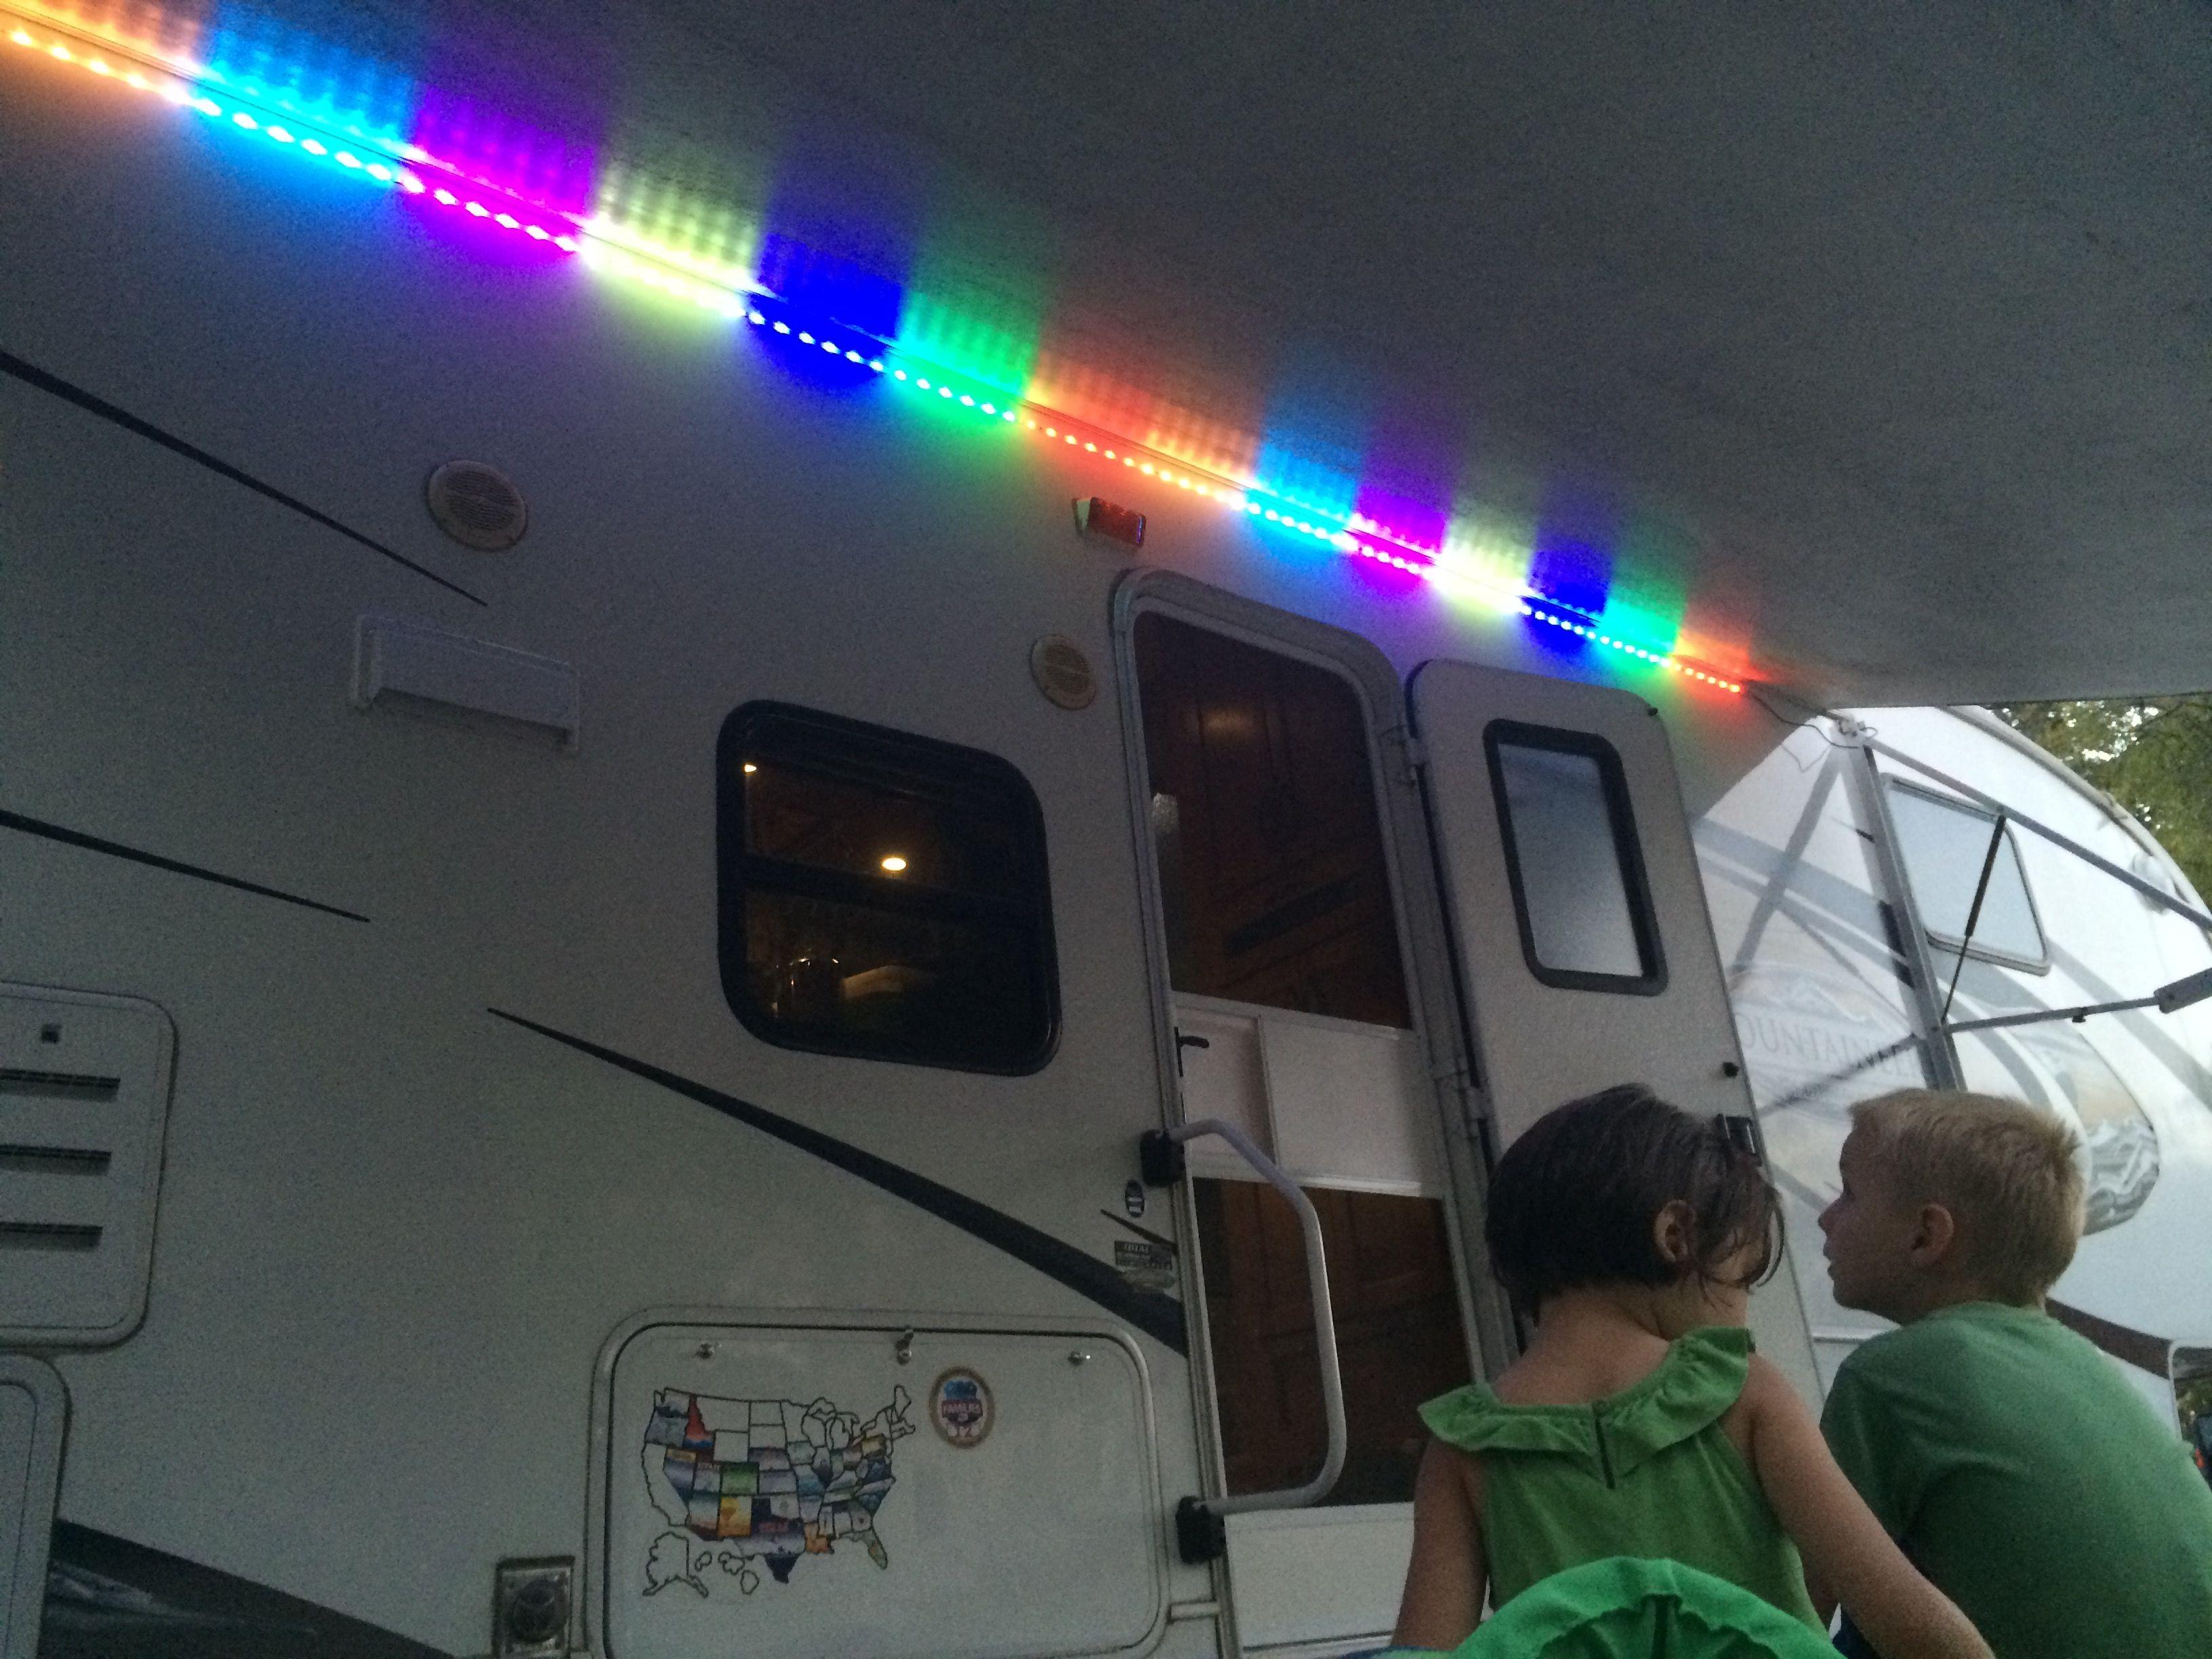 Added Led Lights Under The Awning Rv Mods Camper Rv